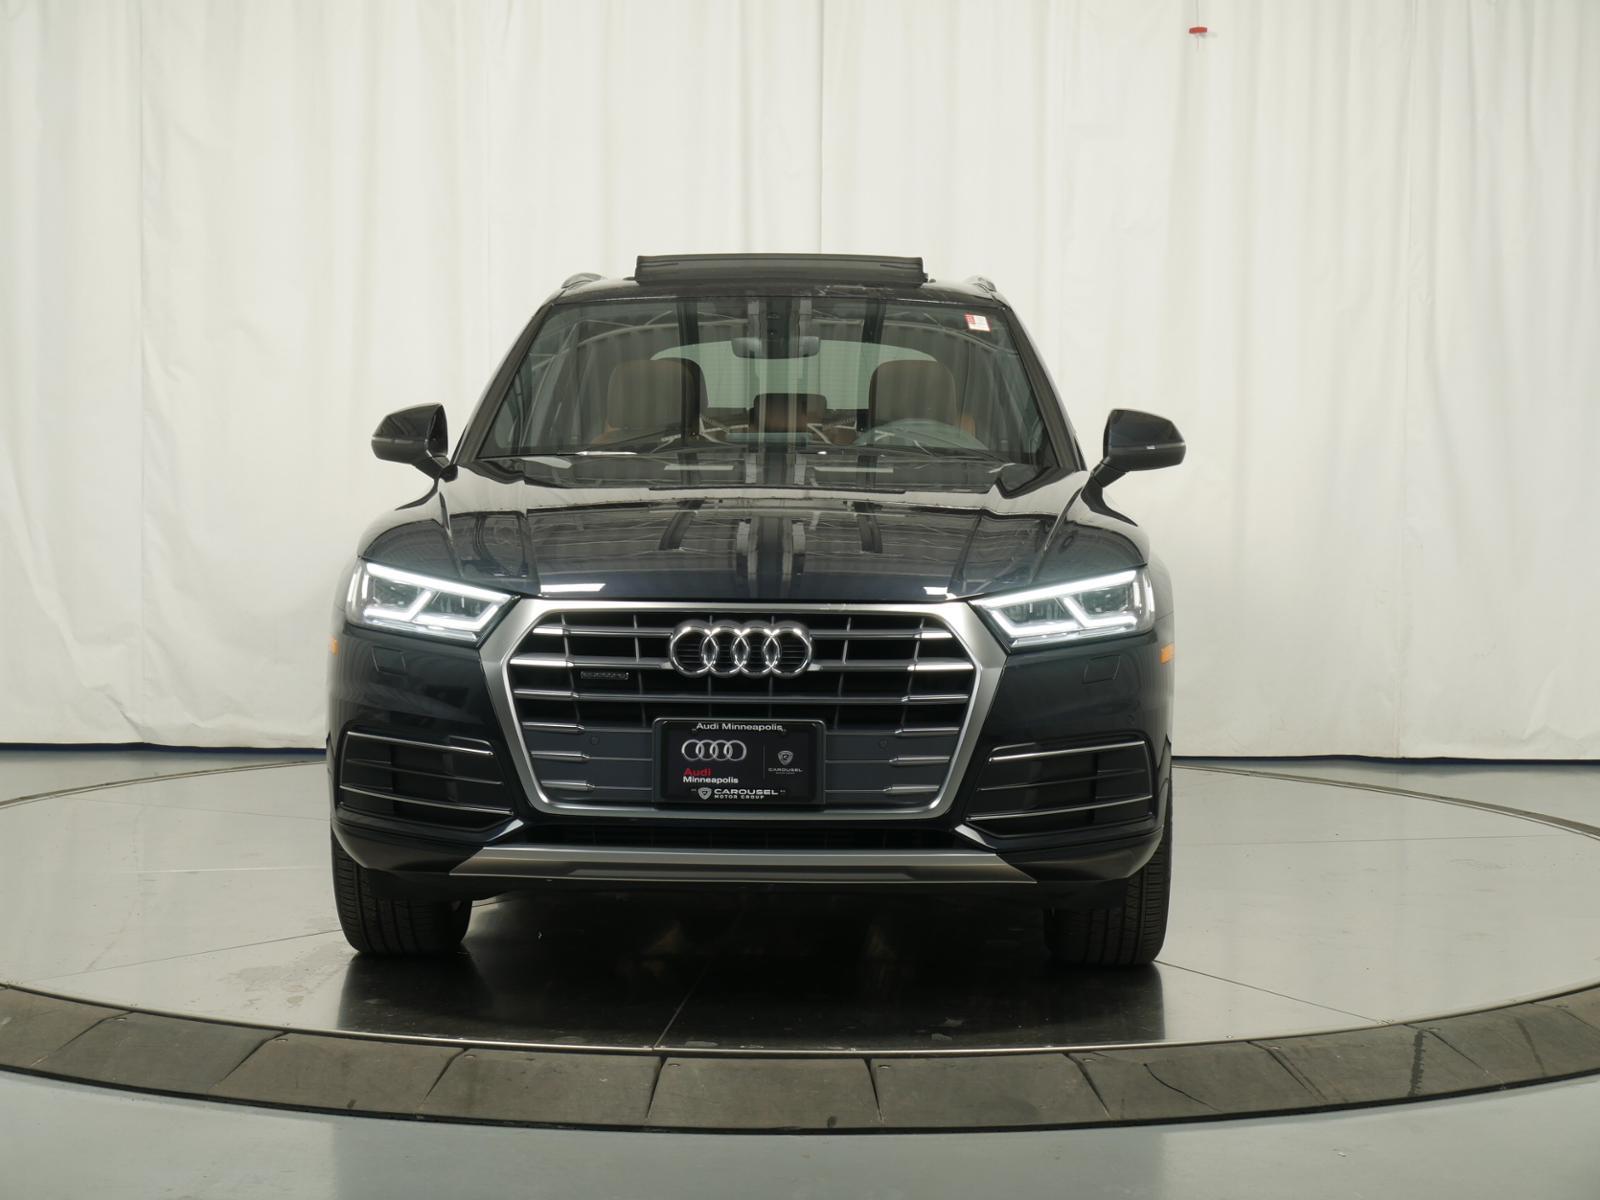 Used 2018 Audi Q5 For Sale at Audi Minneapolis | VIN: WA1BNAFY3J2161259